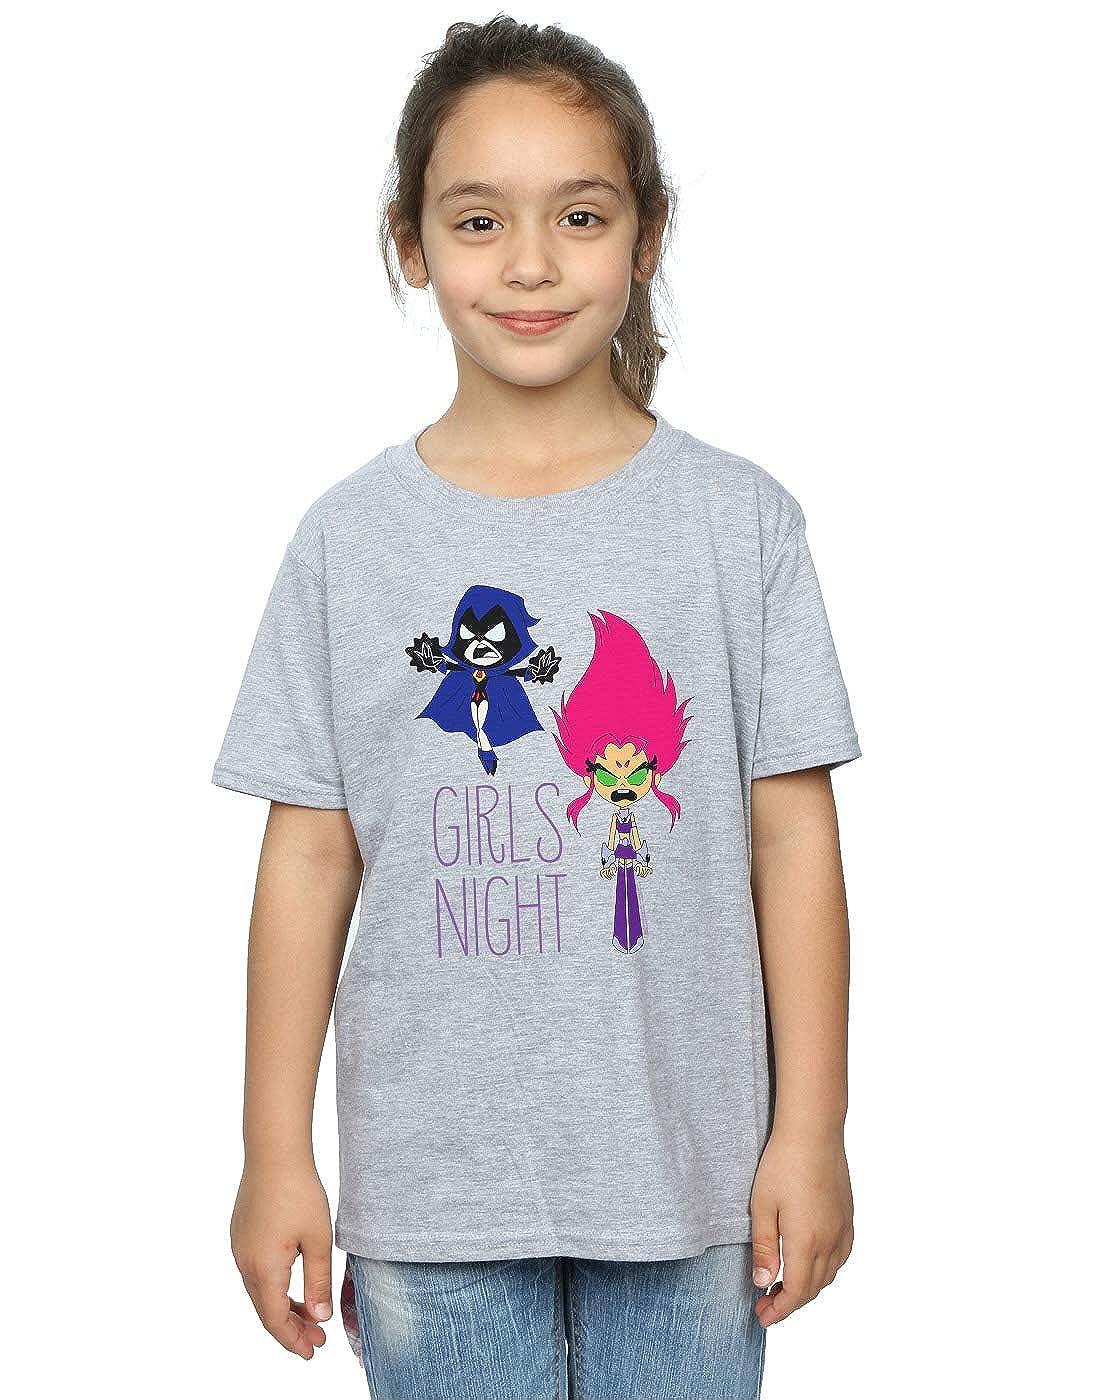 DC Comics Girls Teen Titans Go Girls Night T-Shirt